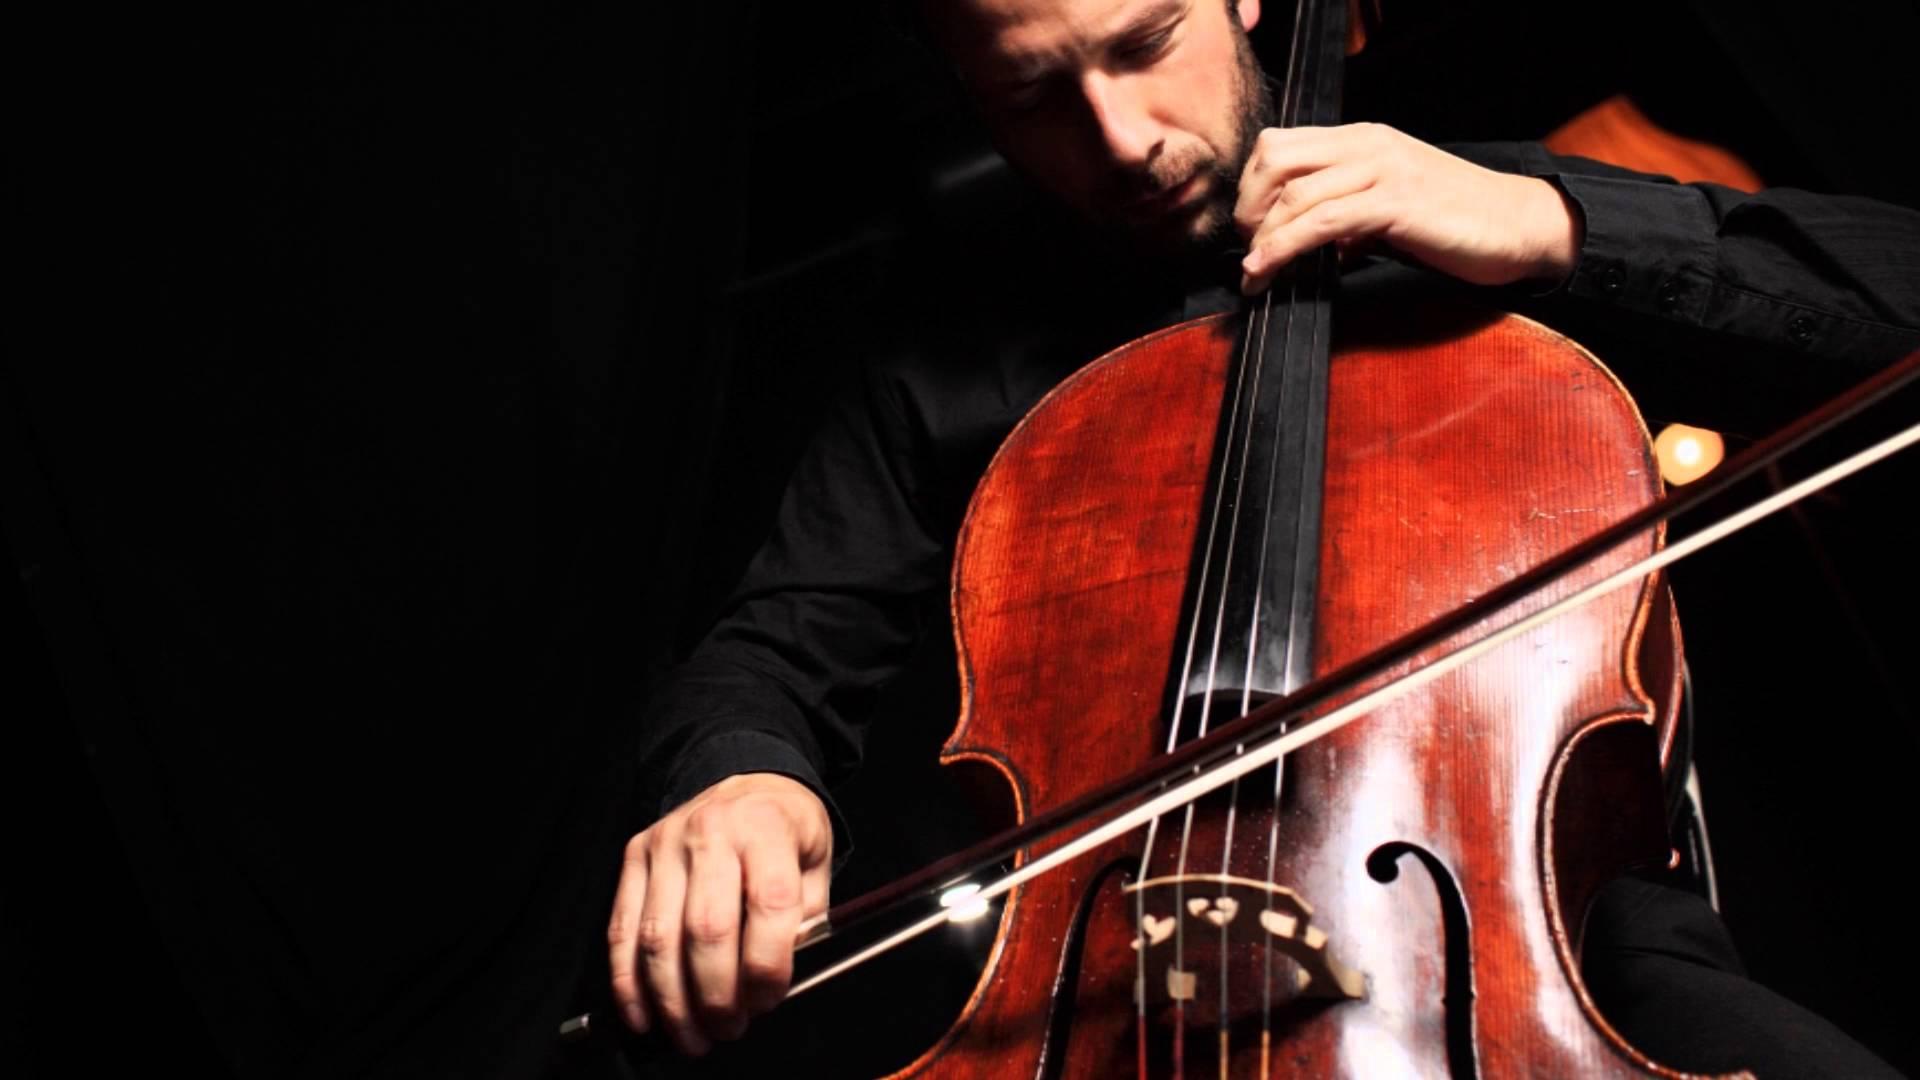 concerto de violoncelo na emufrn